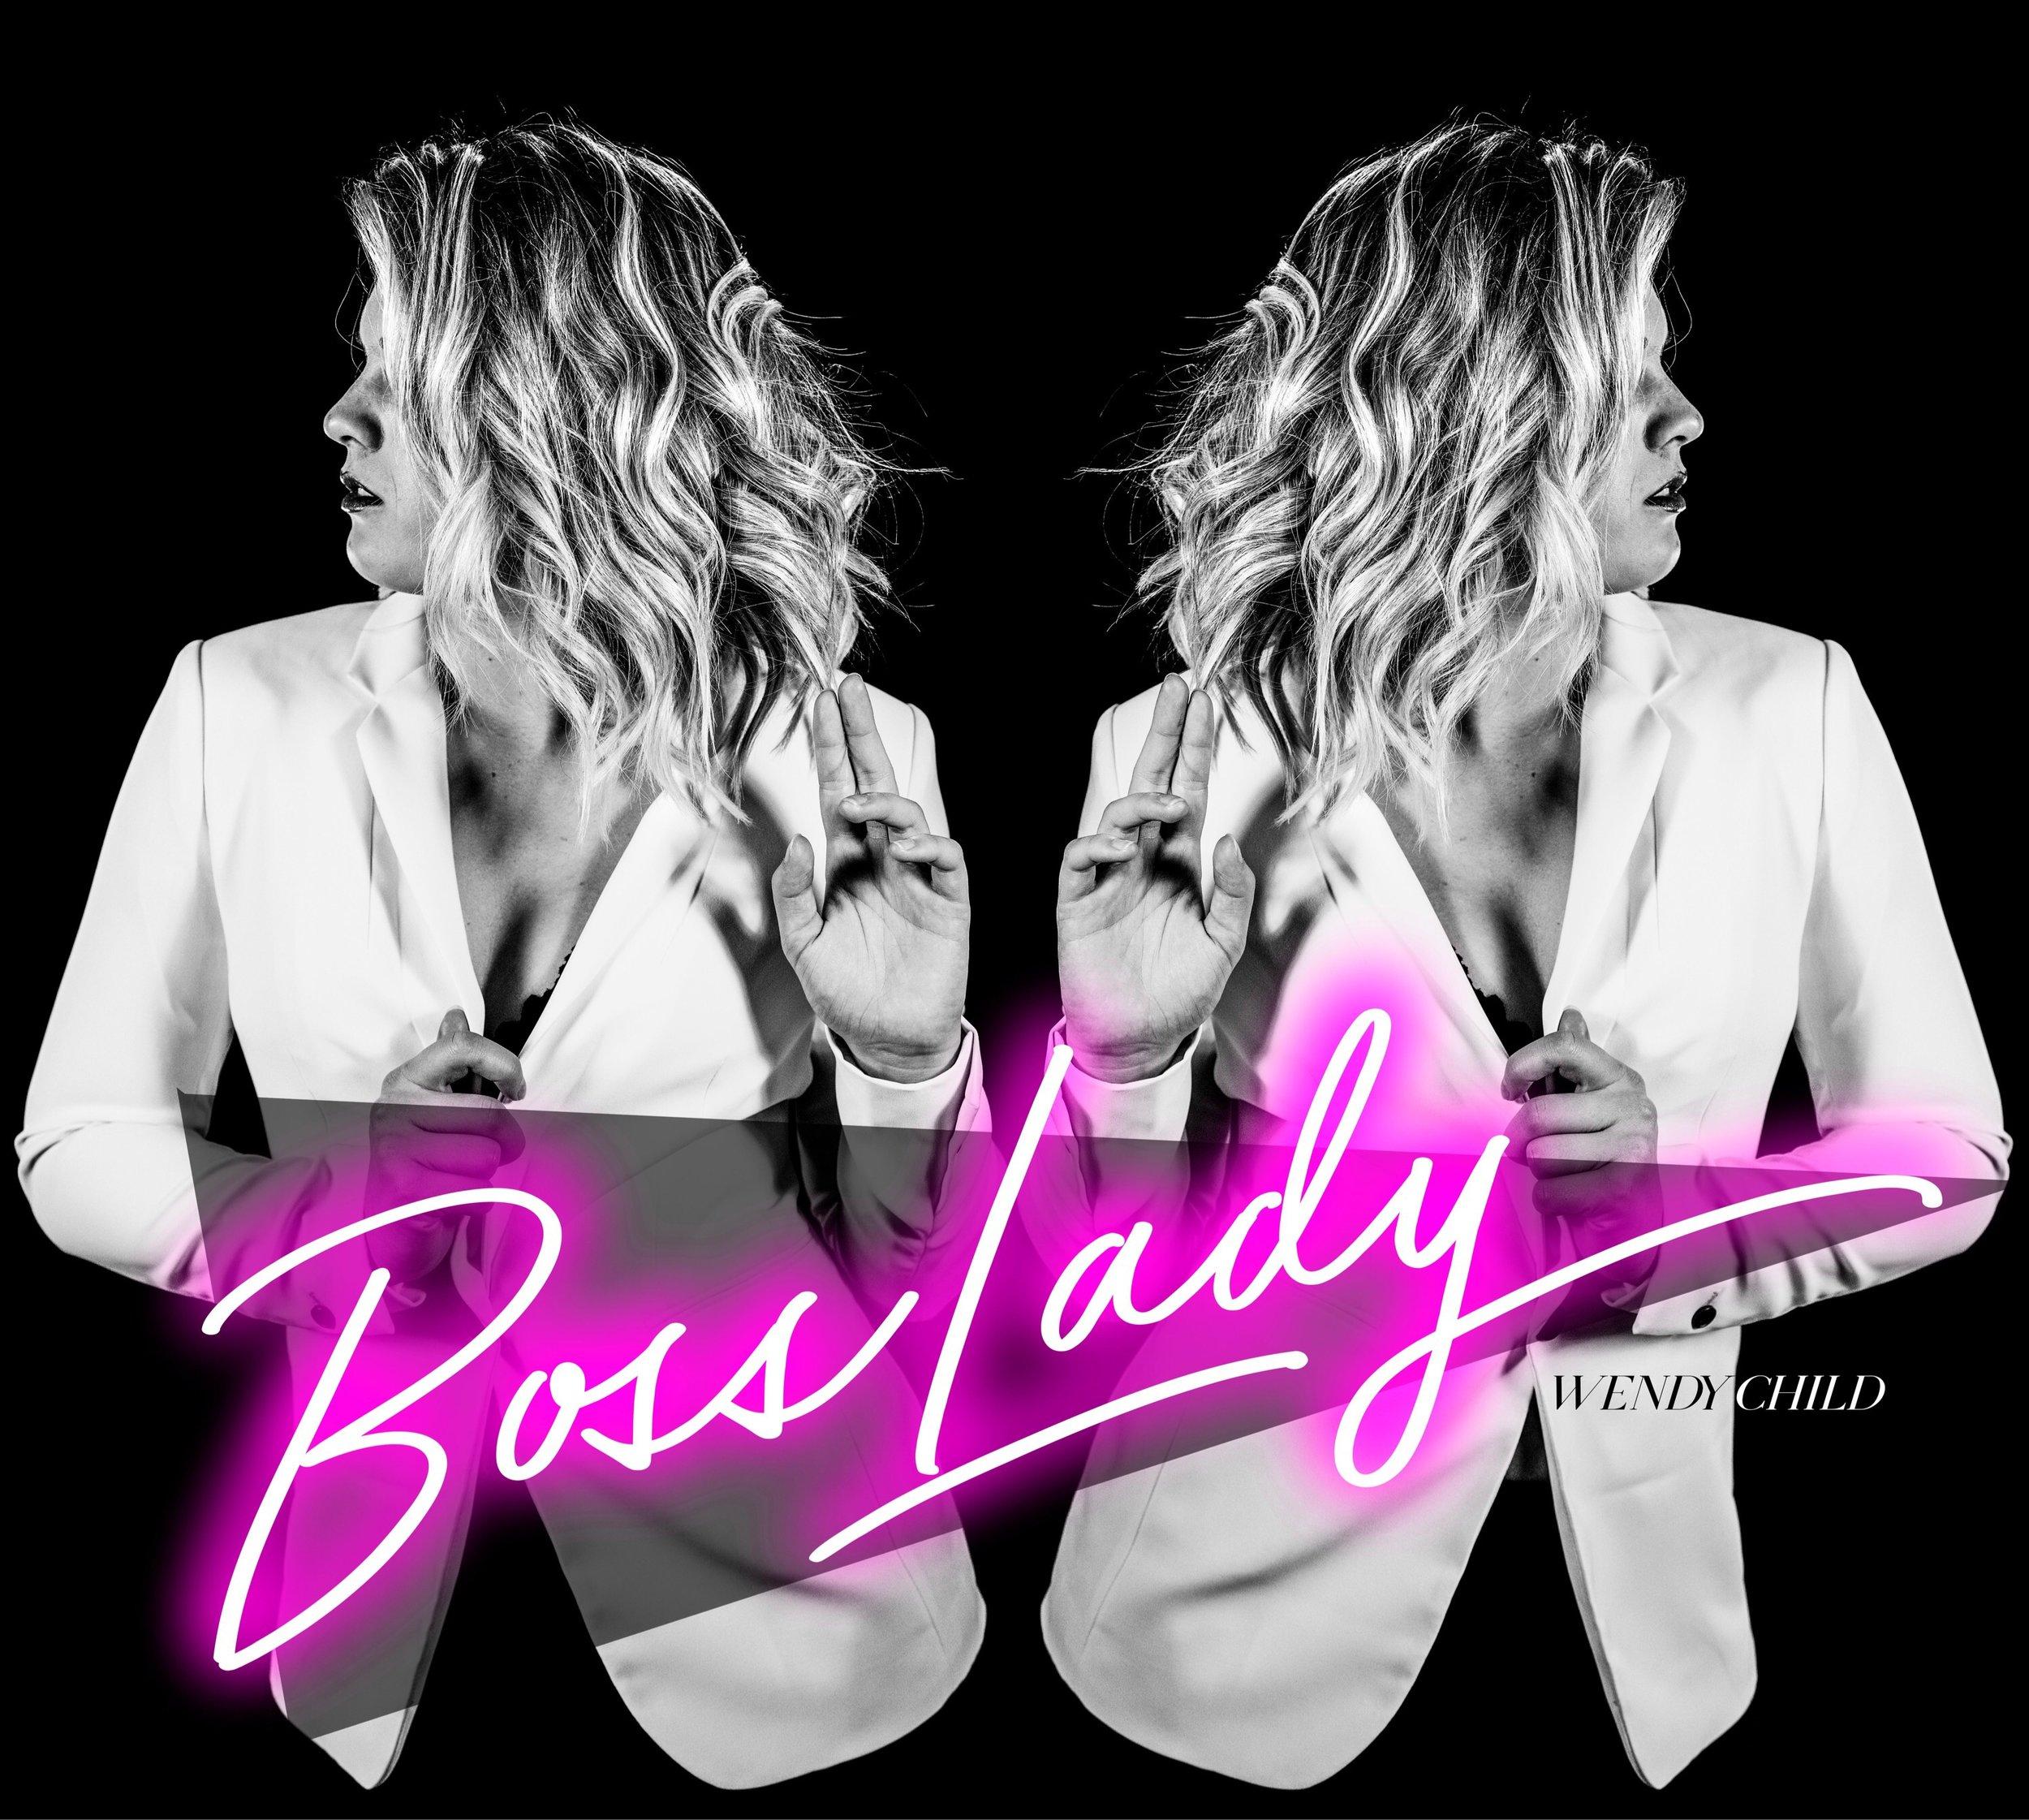 Boss Lady Cover Art.JPG